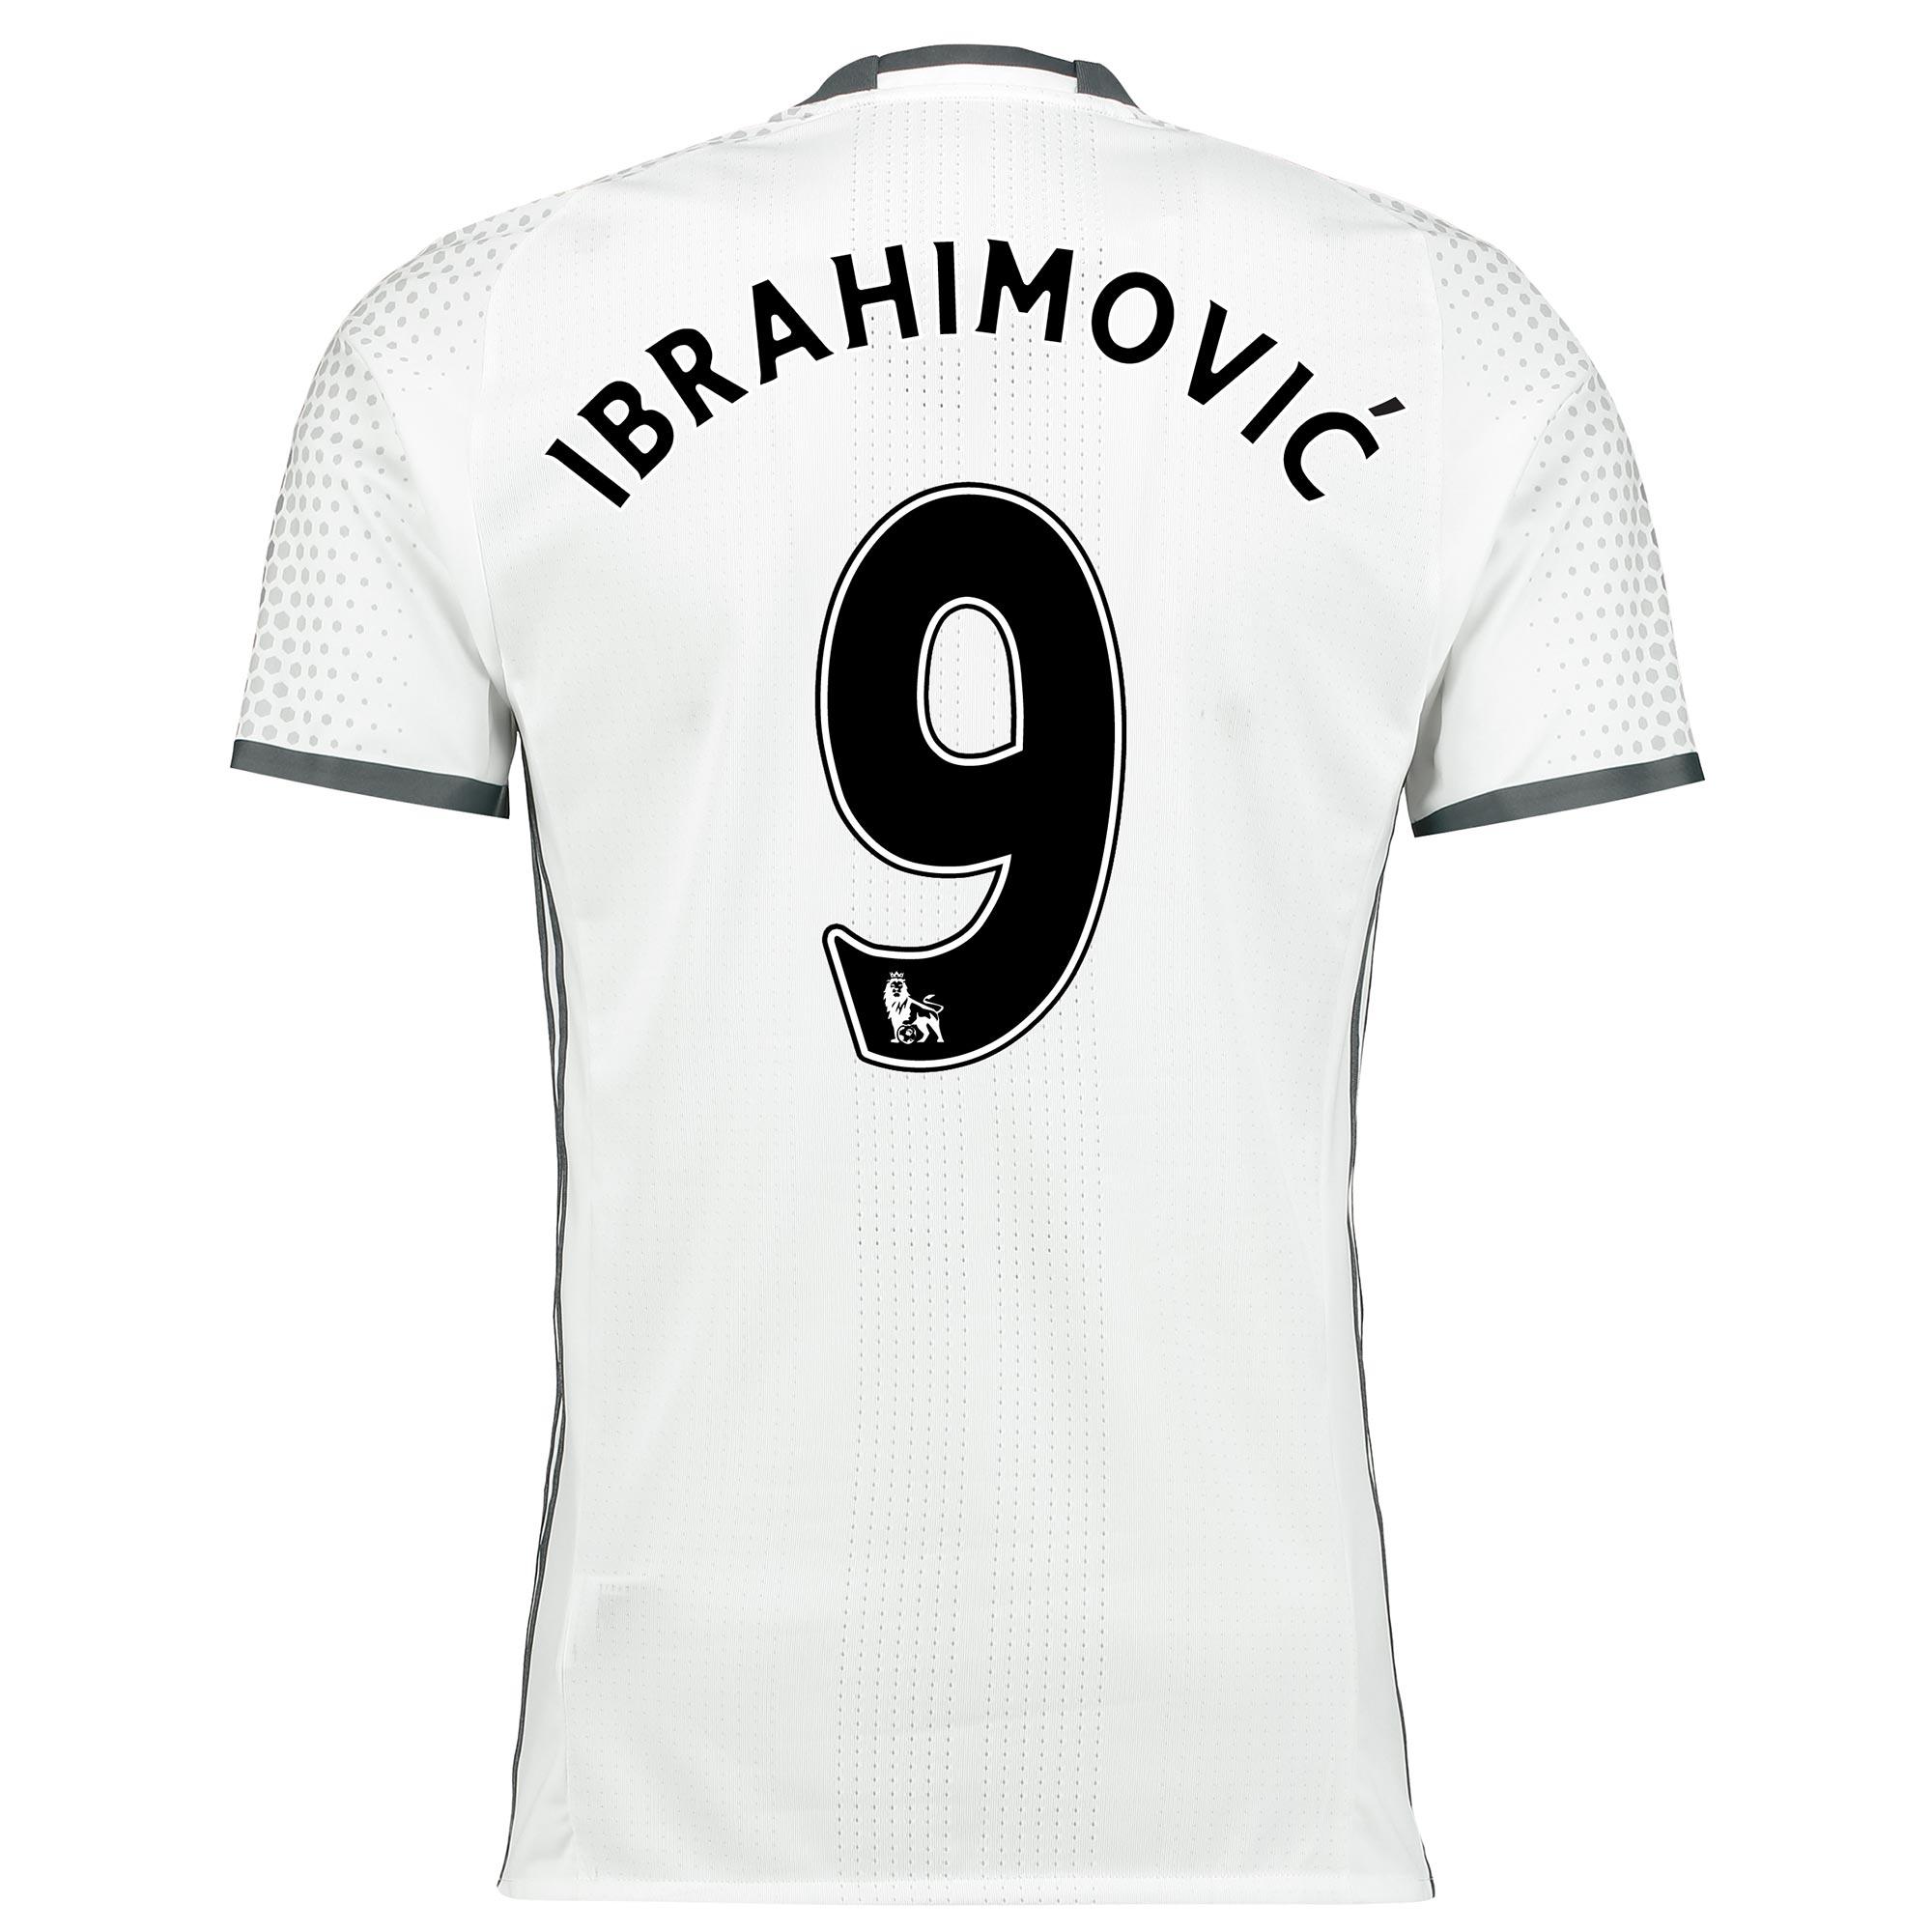 Troisième Maillot Adizero Manchester United 2016-17 - Ibrahimovic 9